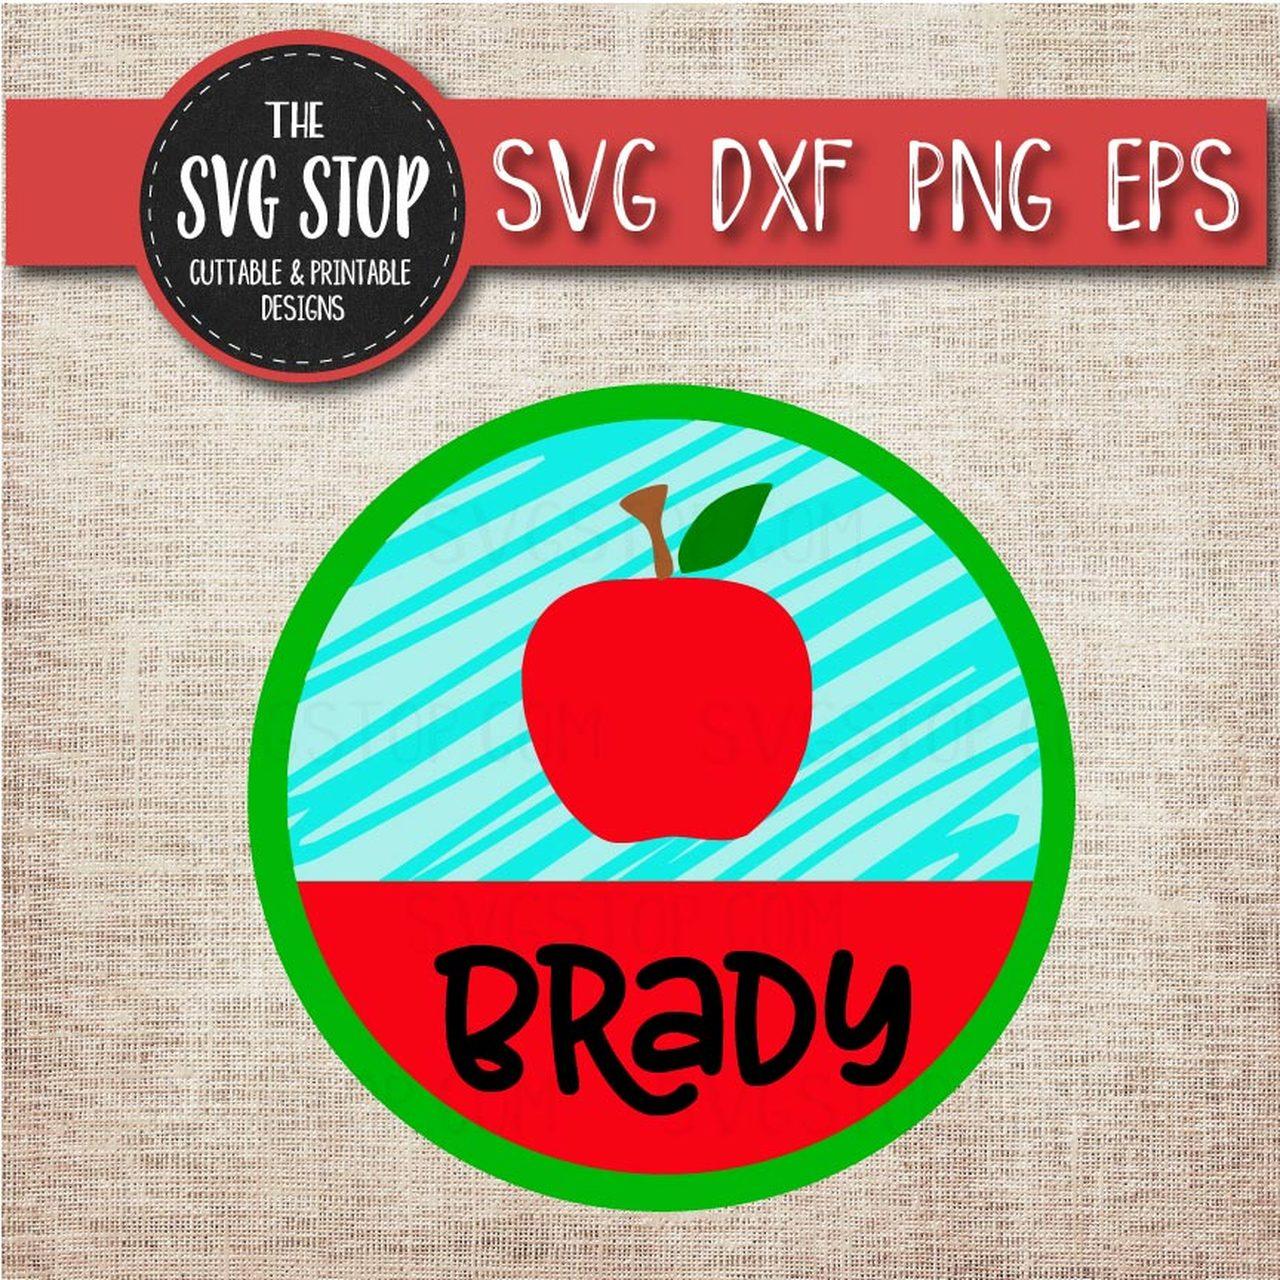 Apple frame clipart clipart download Apple Monogram Name Frame - School - Teacher - Svg Dxf Png Eps - Clipart -  Cut File clipart download